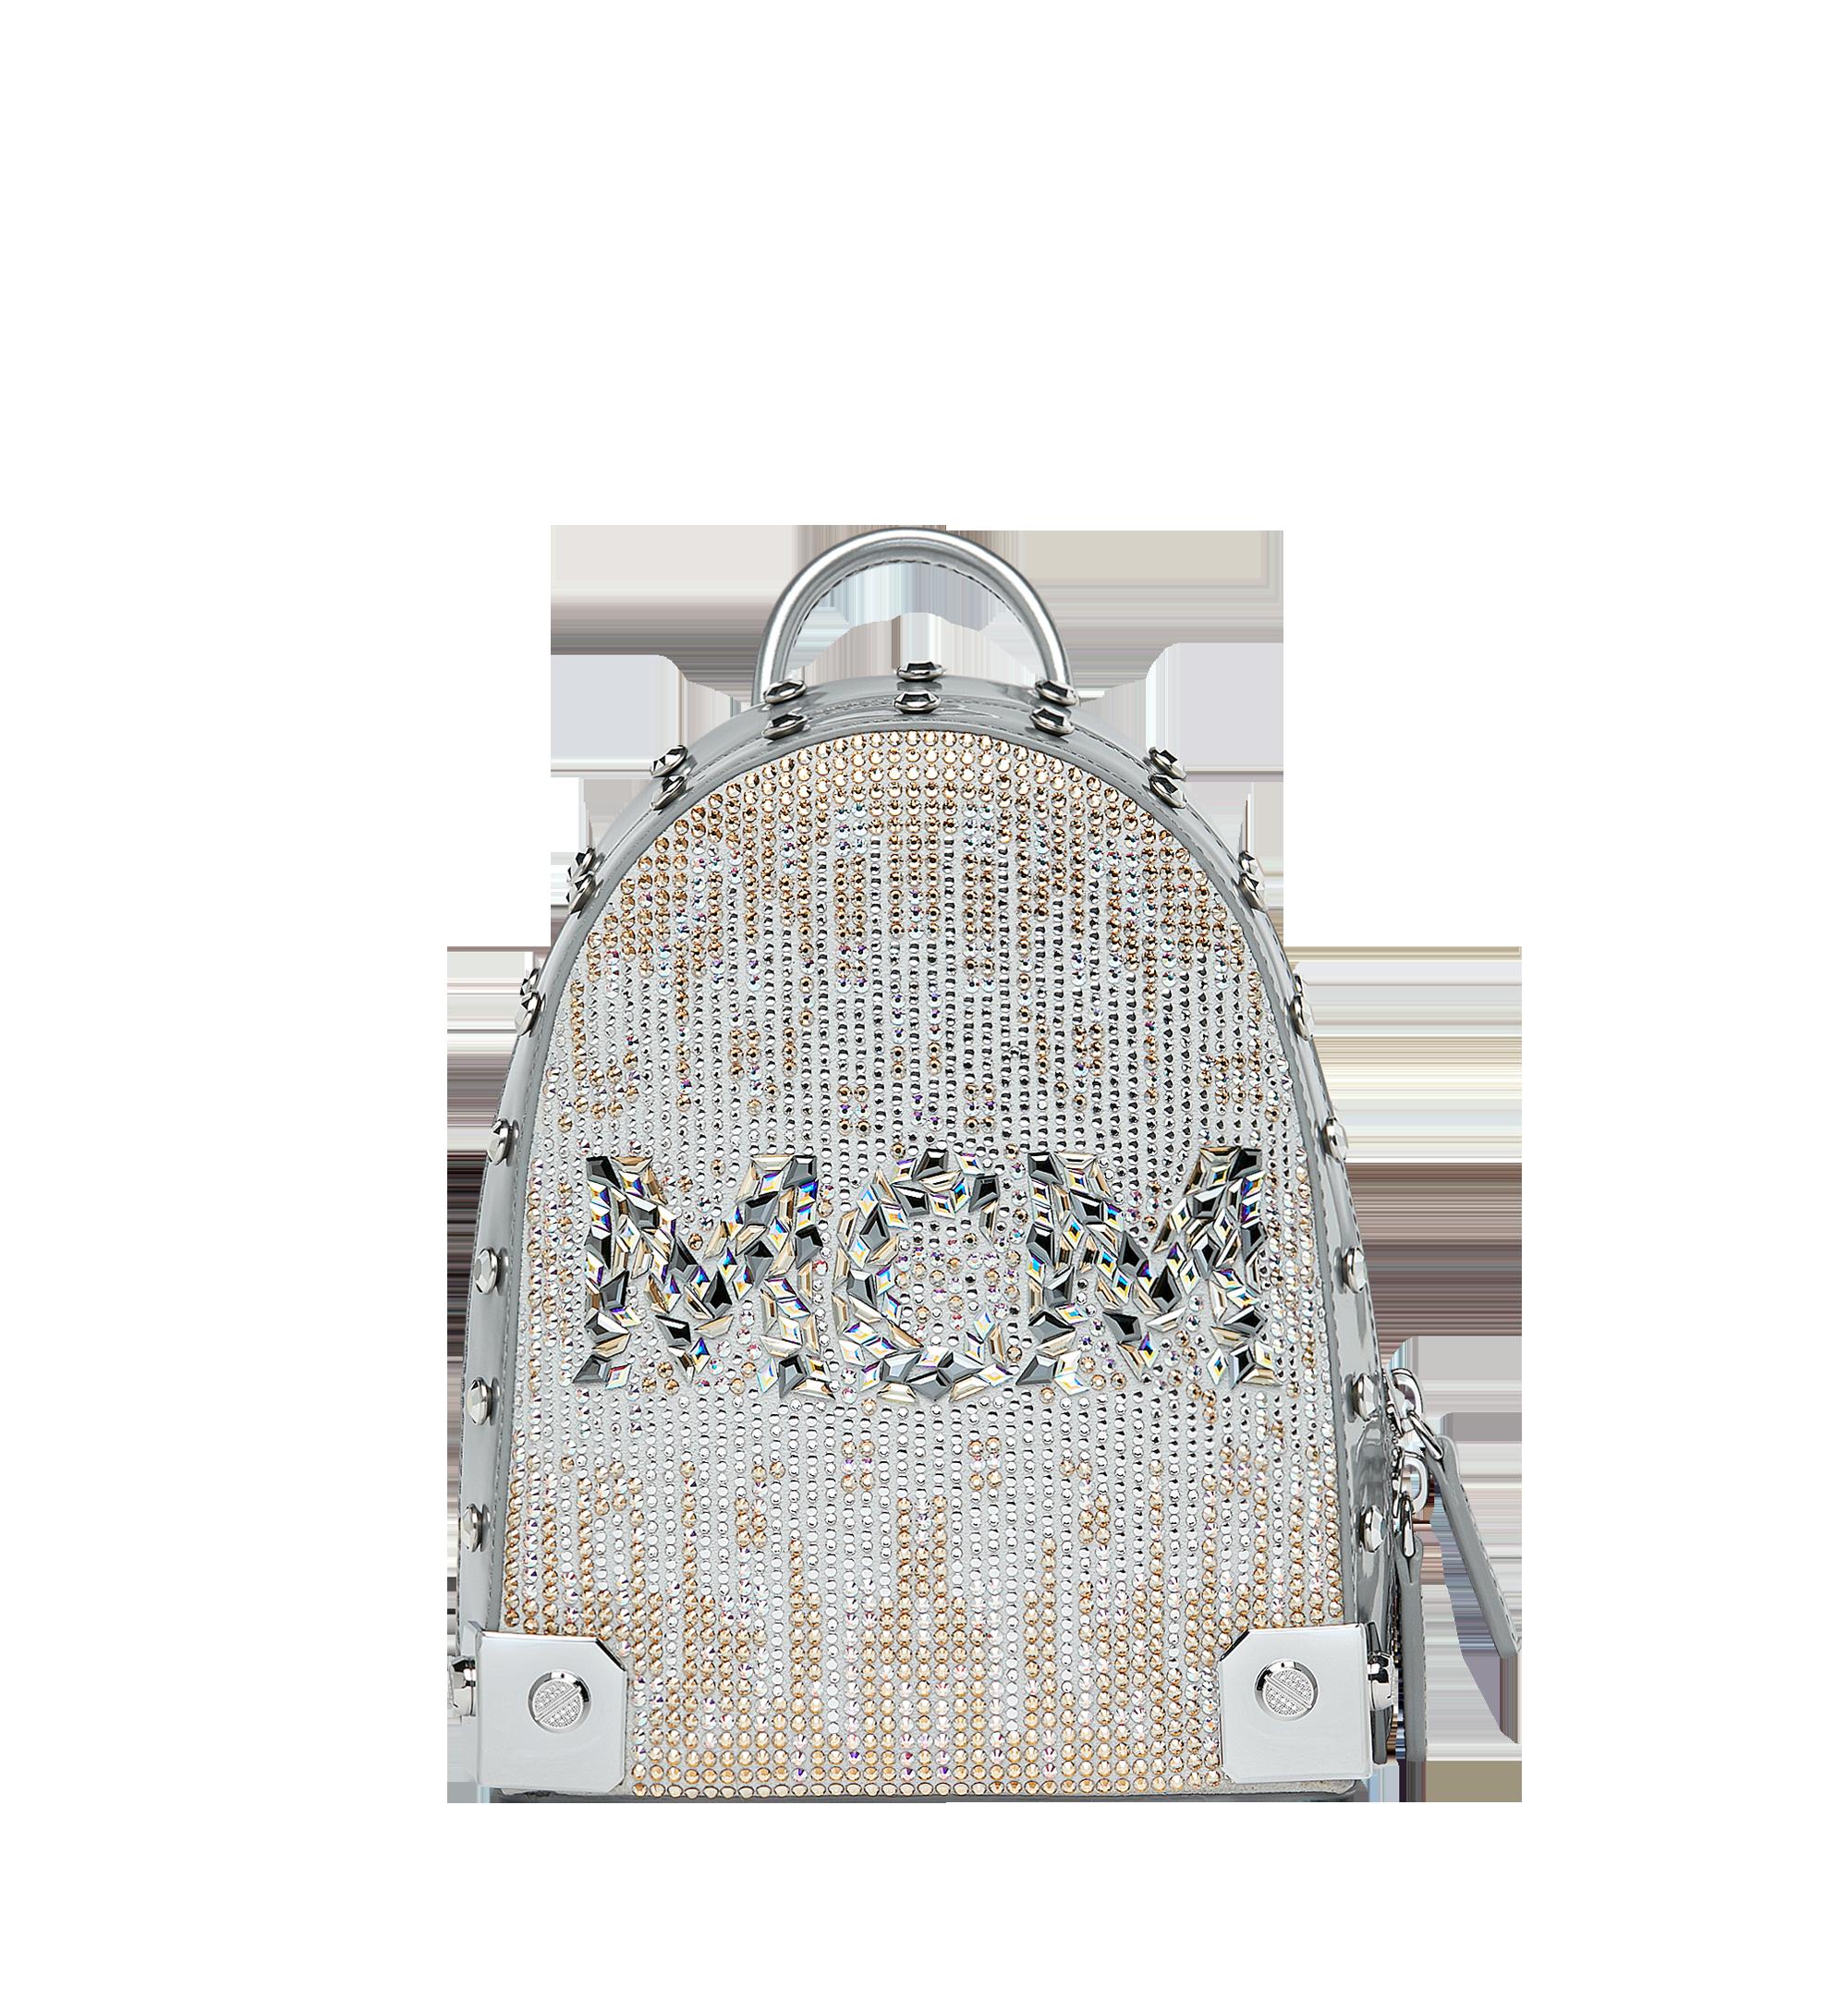 MCM Stark Bebe Boo Backpack in Mosaic Crystal Silver MWK9SMS01SB001 Alternate View 1